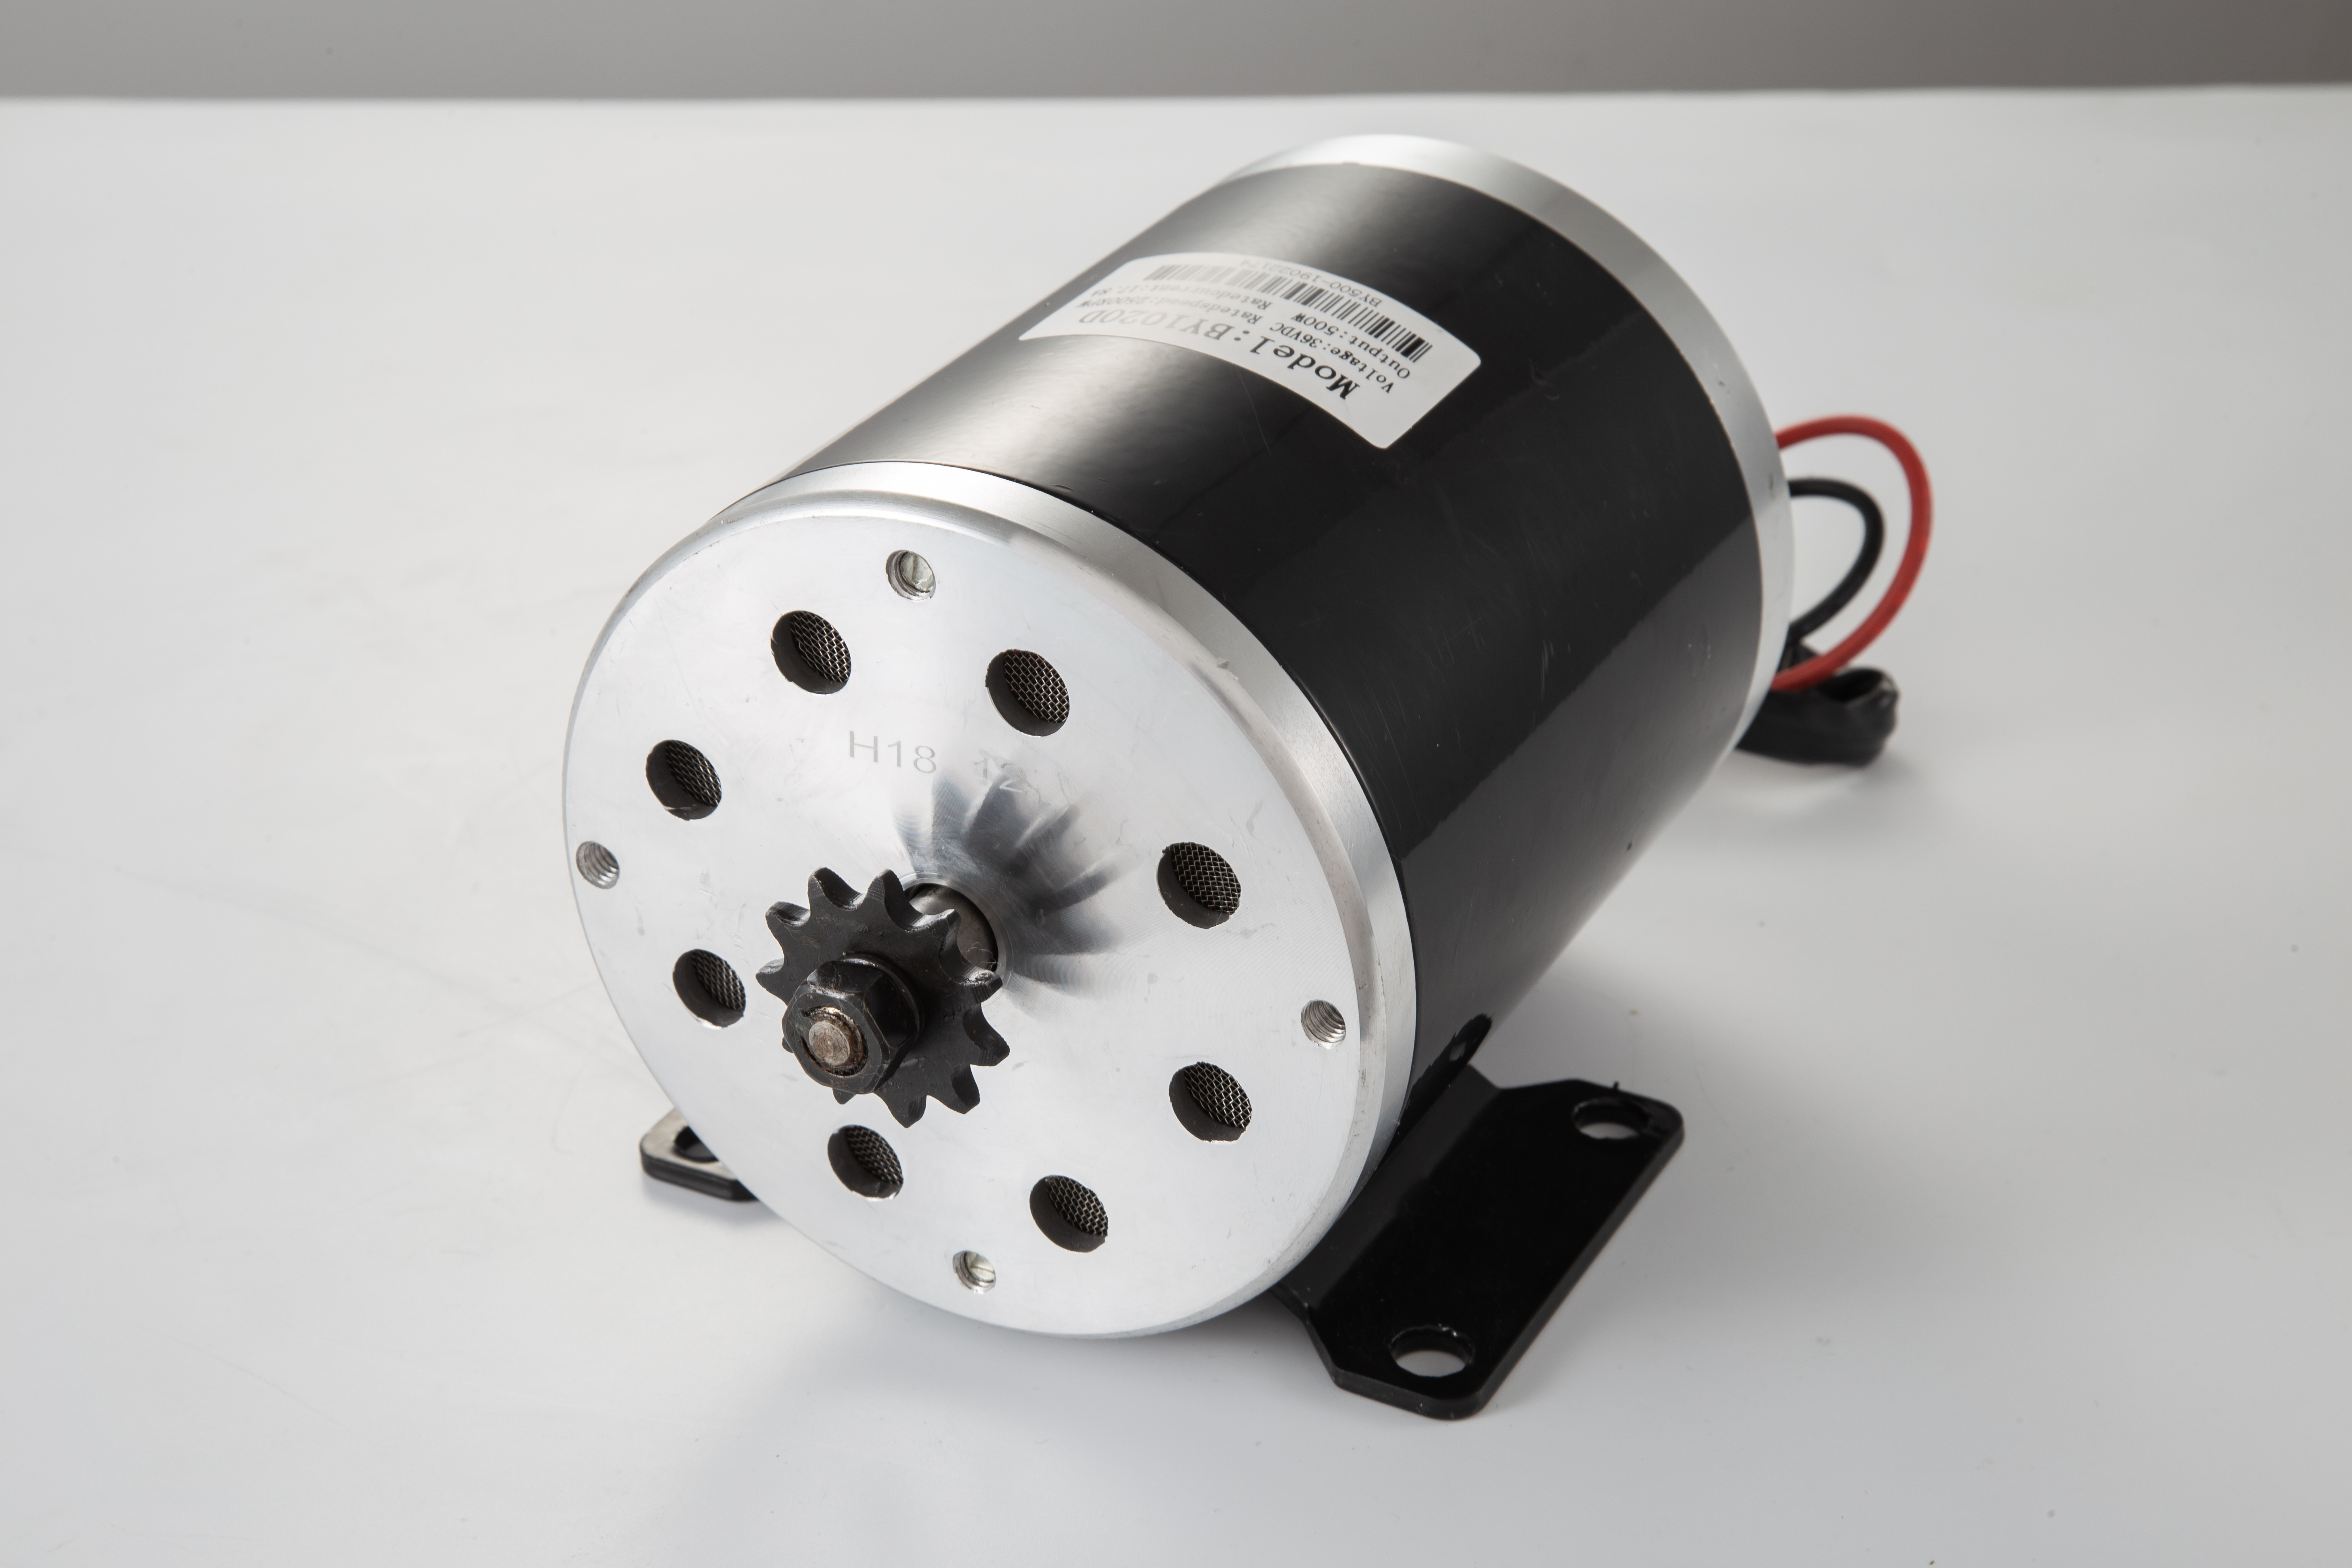 36v-Electric-Motor-controller-throttle-kit-f-Scooter-E-Scooter-ATV-Permanent thumbnail 40